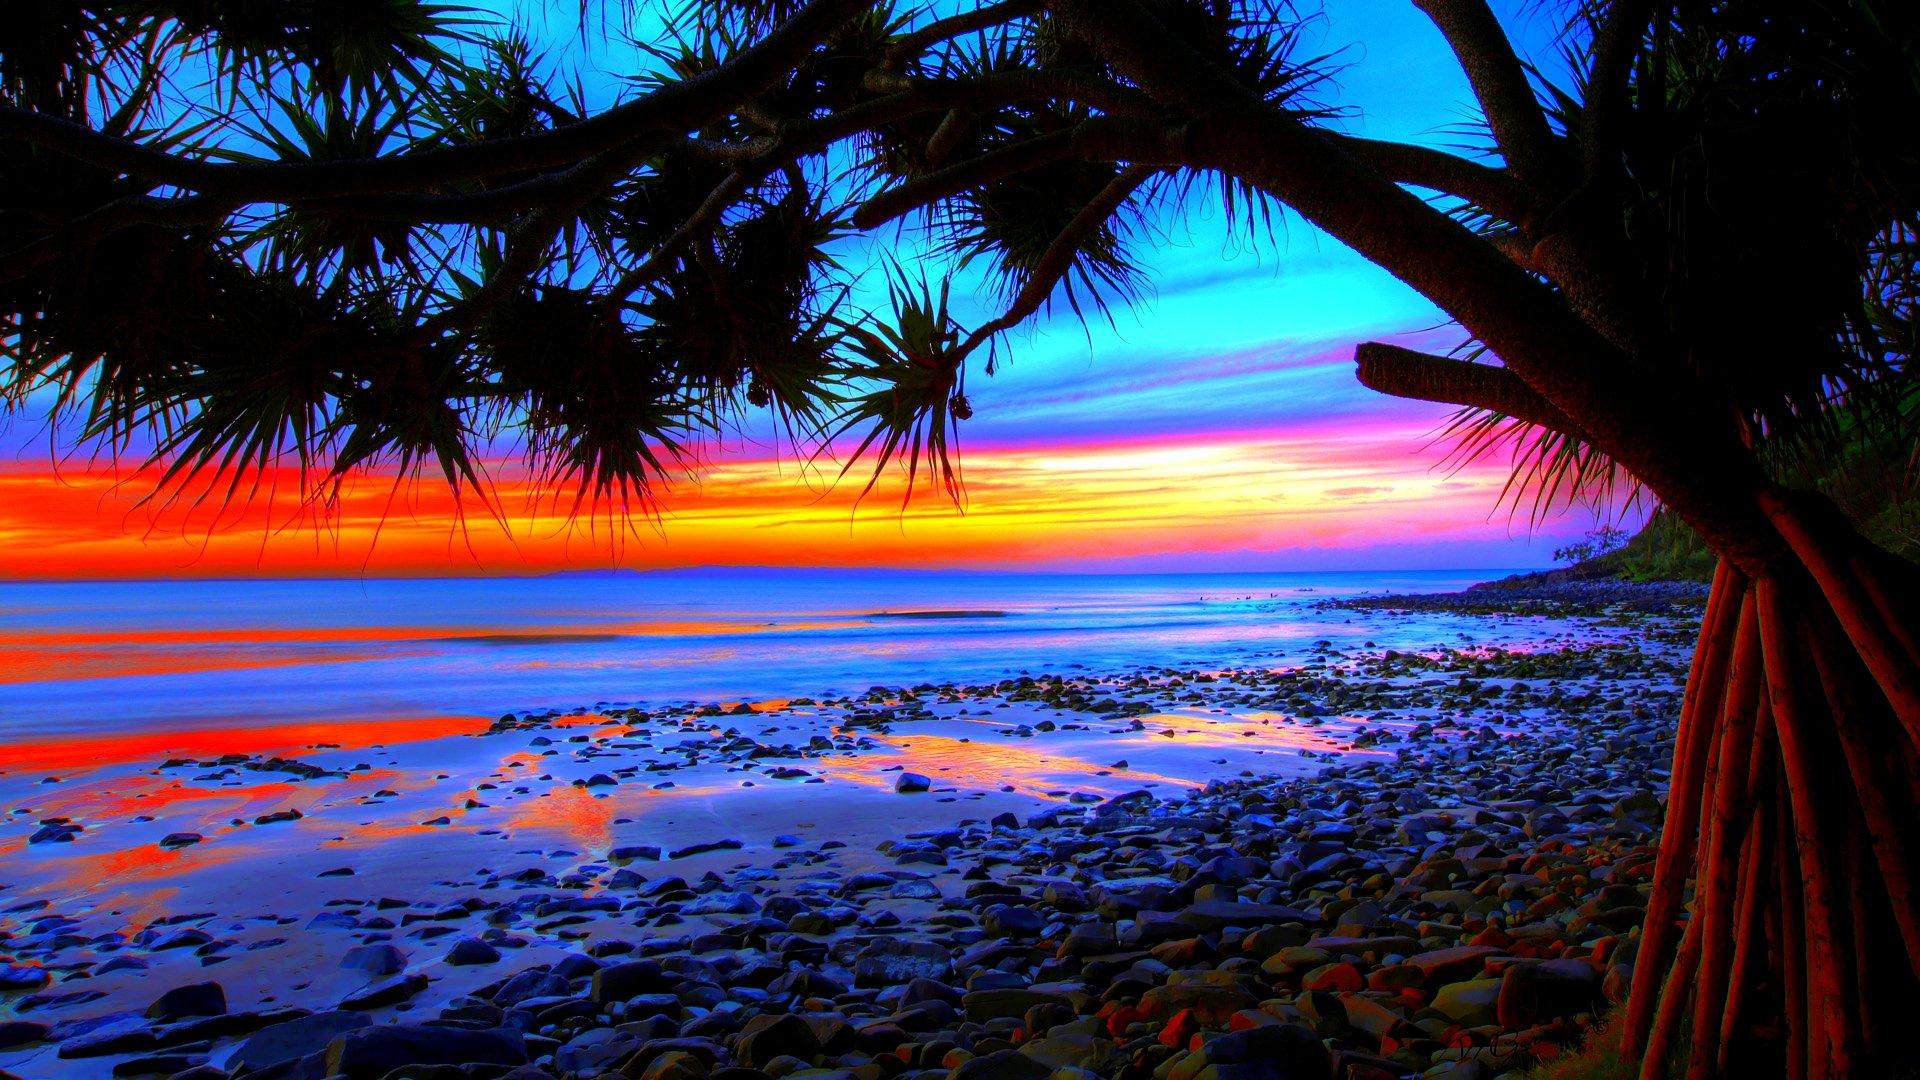 Beach Sunset Hammock Wallpapers